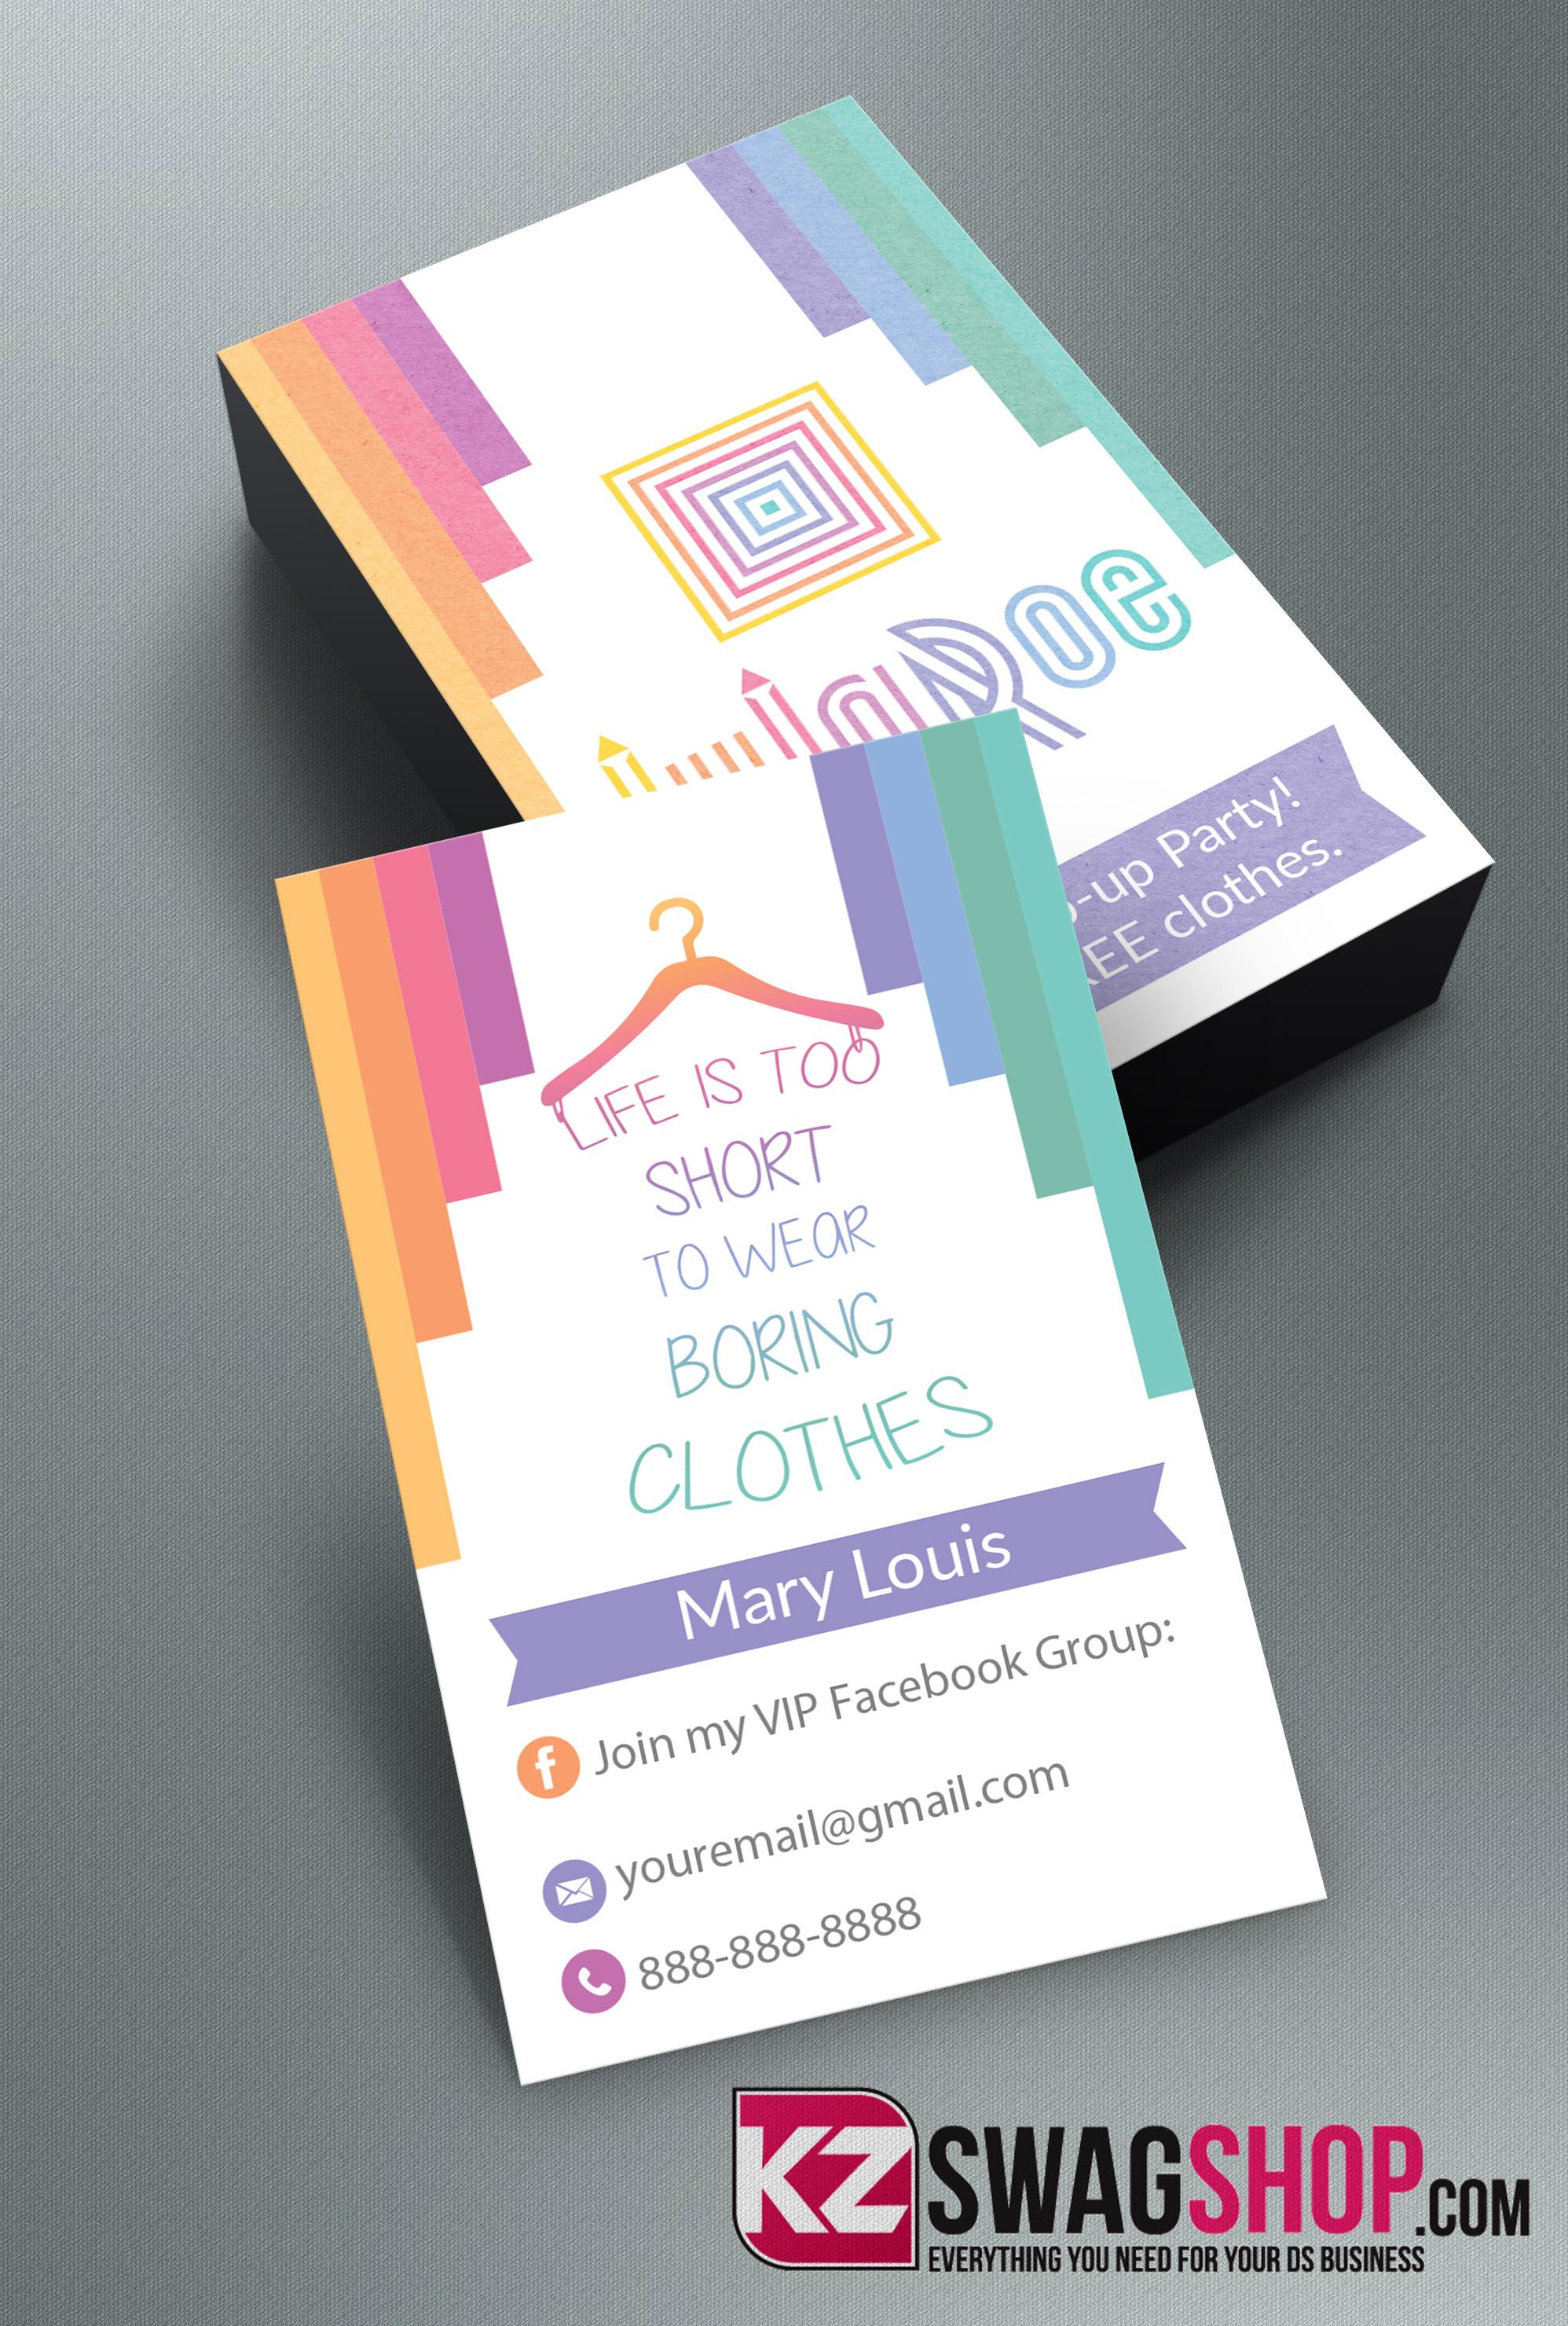 Lularoe business cards 6 kz creative services online store lularoe business cards 6 reheart Gallery